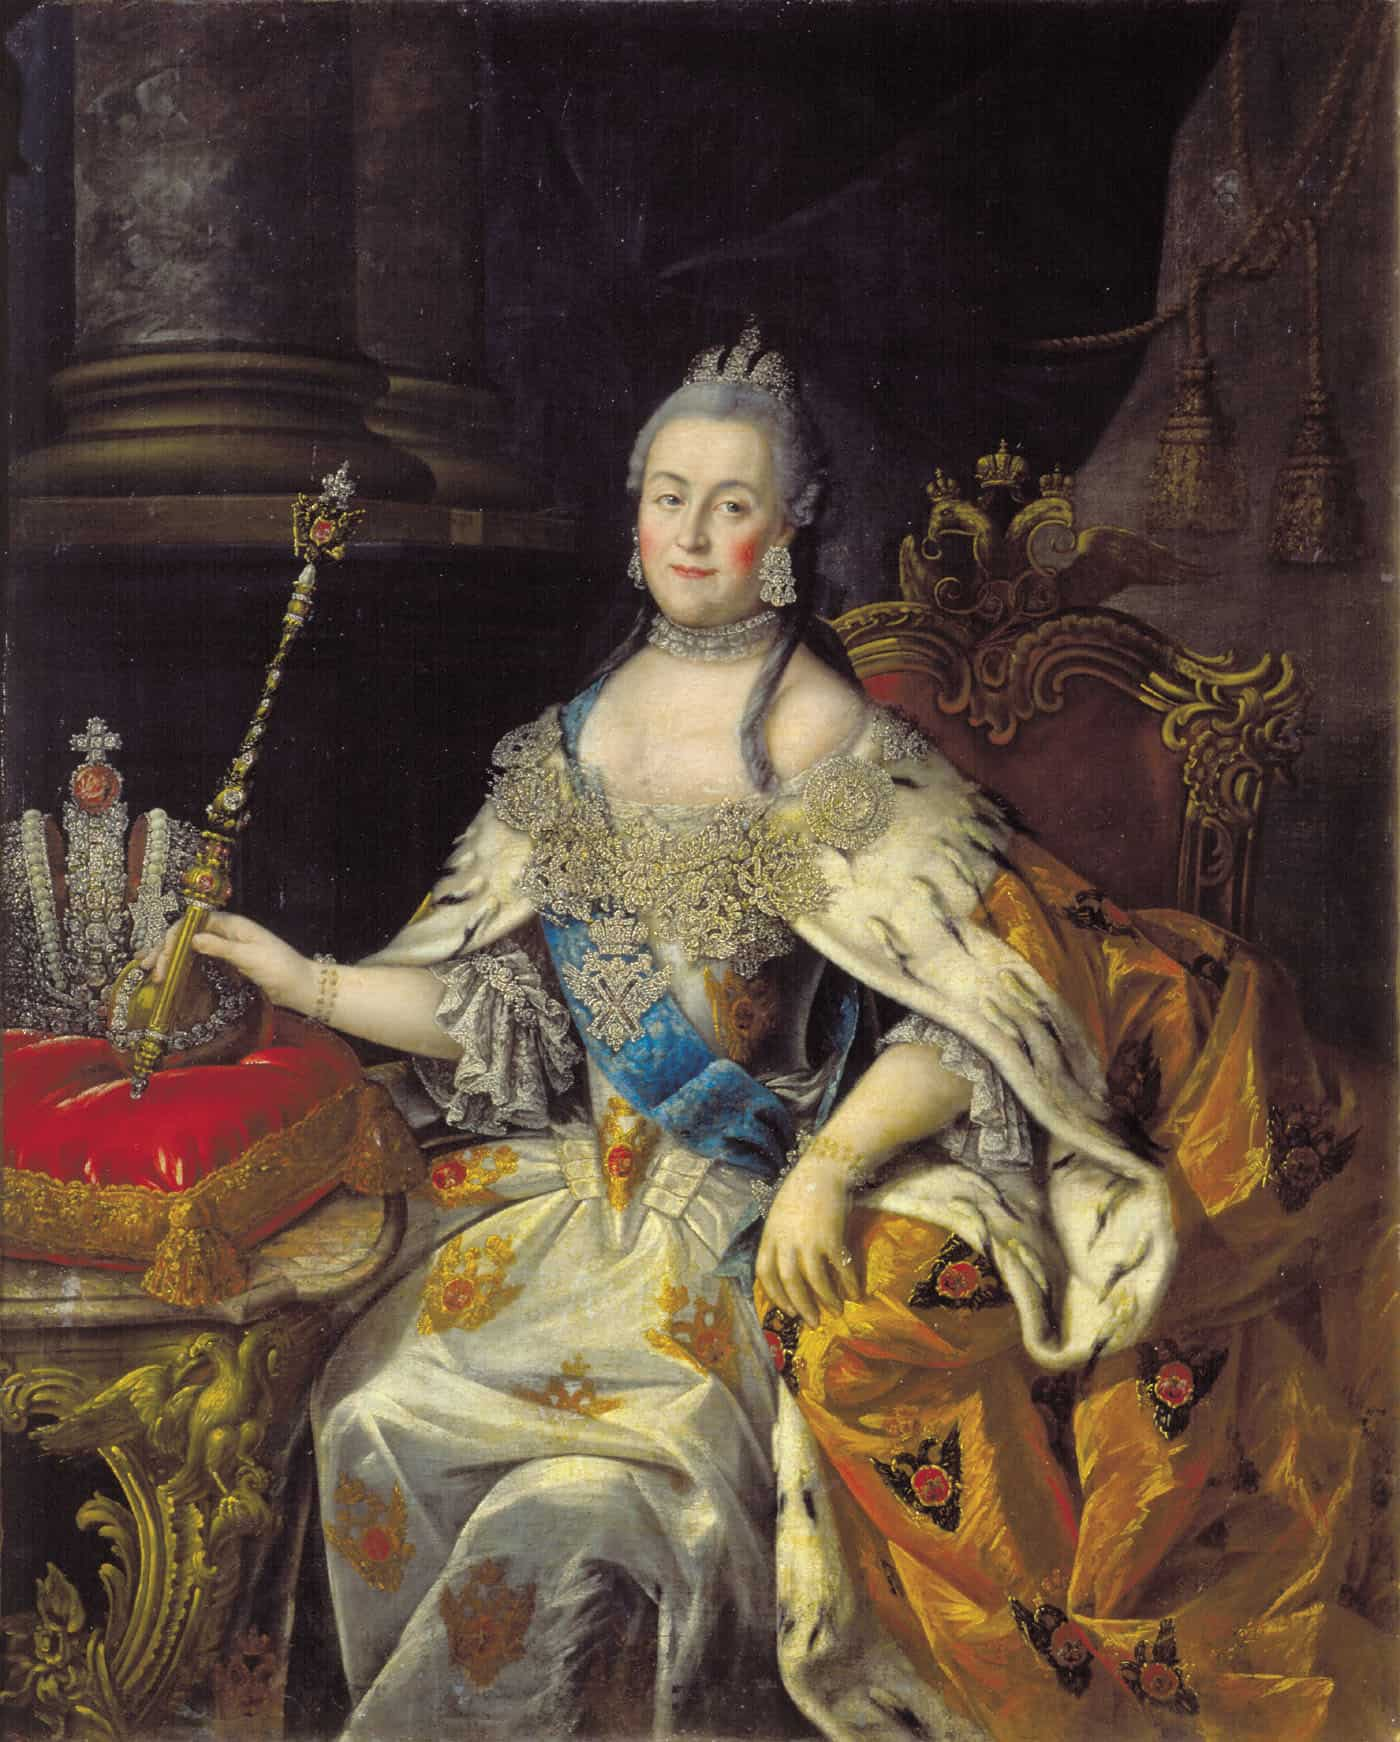 Catherine The Great, Potrait of Antropov Alexey Petrovich